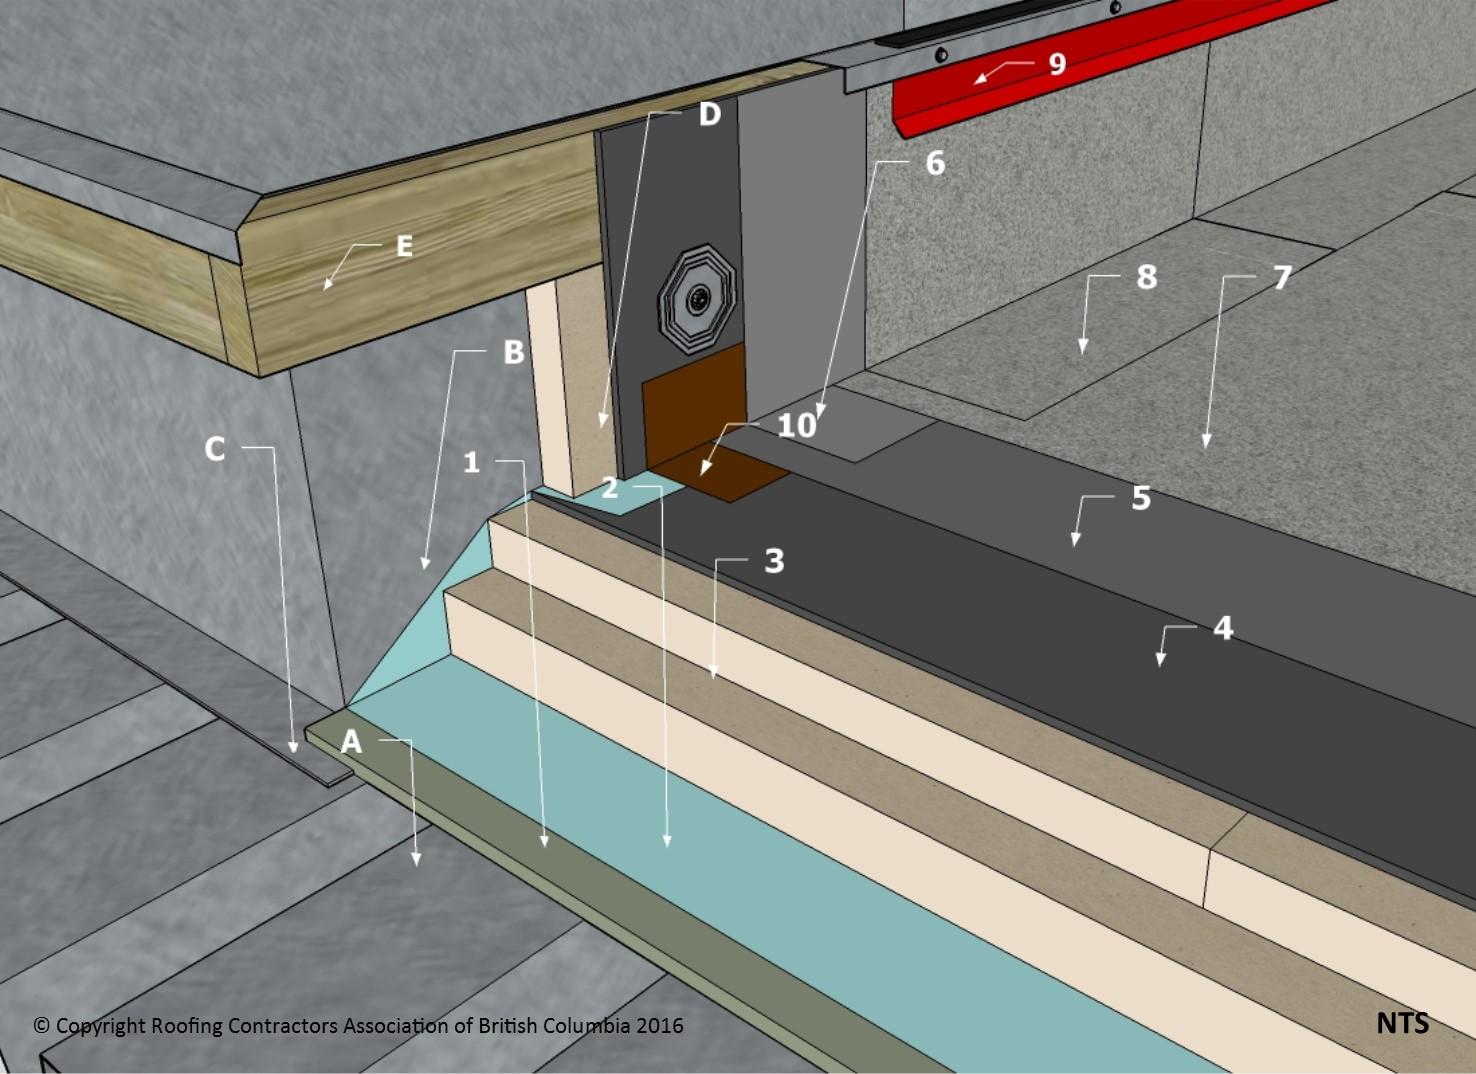 Sbs Details D1 7 6 4 Curbs Amp Sleepers Mechanical Opening